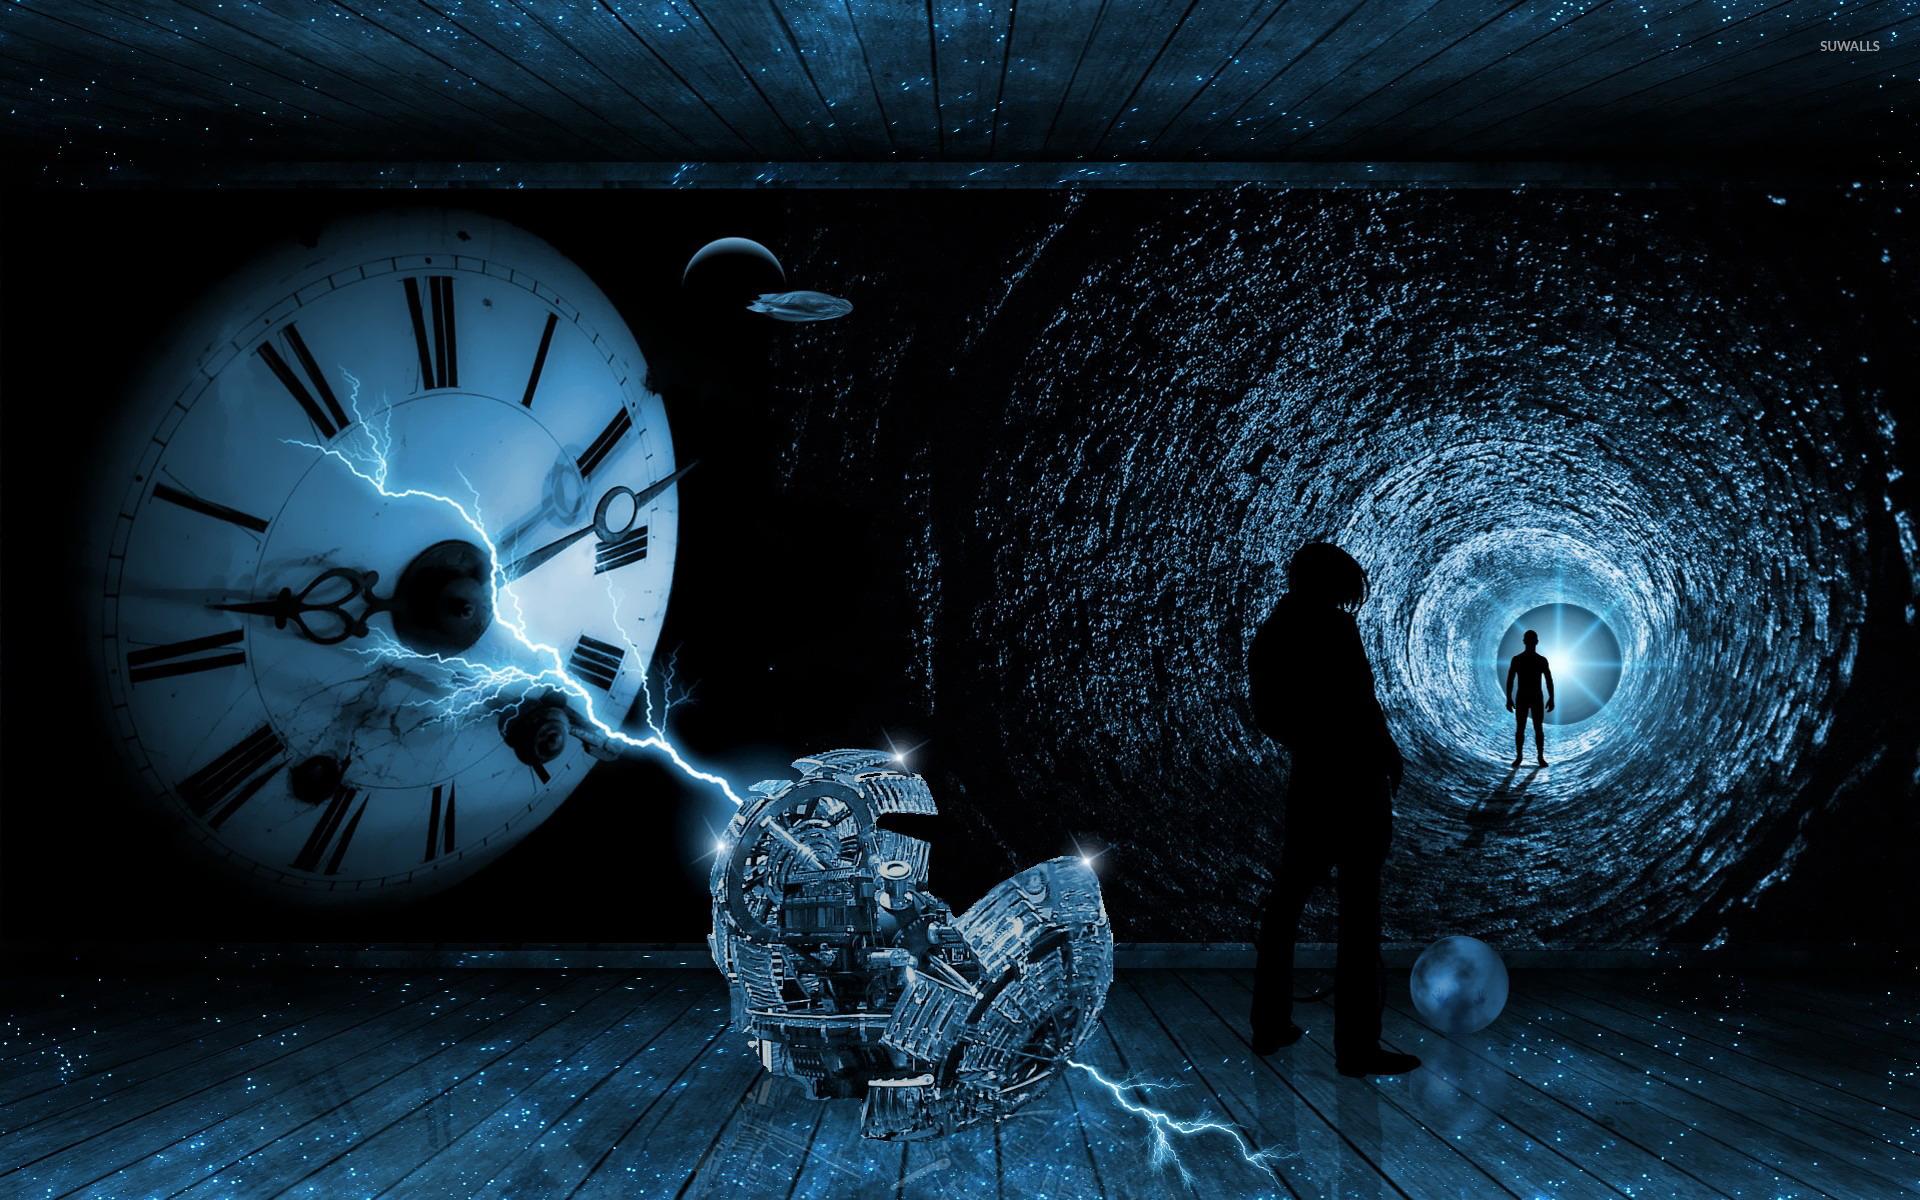 Time traveller wallpaper   Fantasy wallpapers   17644 1280x800